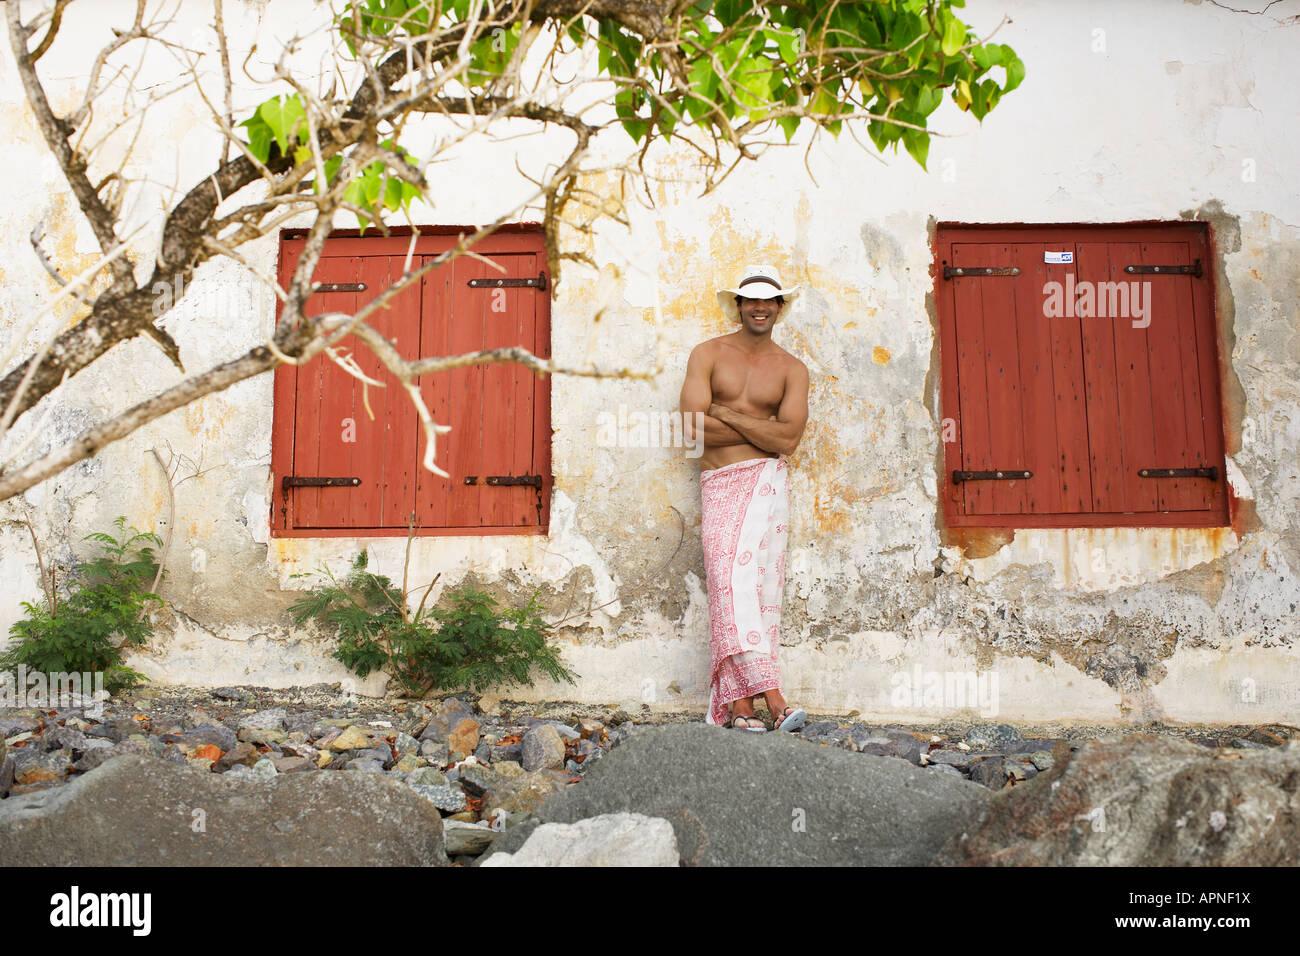 Jeune homme en sarong et hat standing by old house Banque D'Images